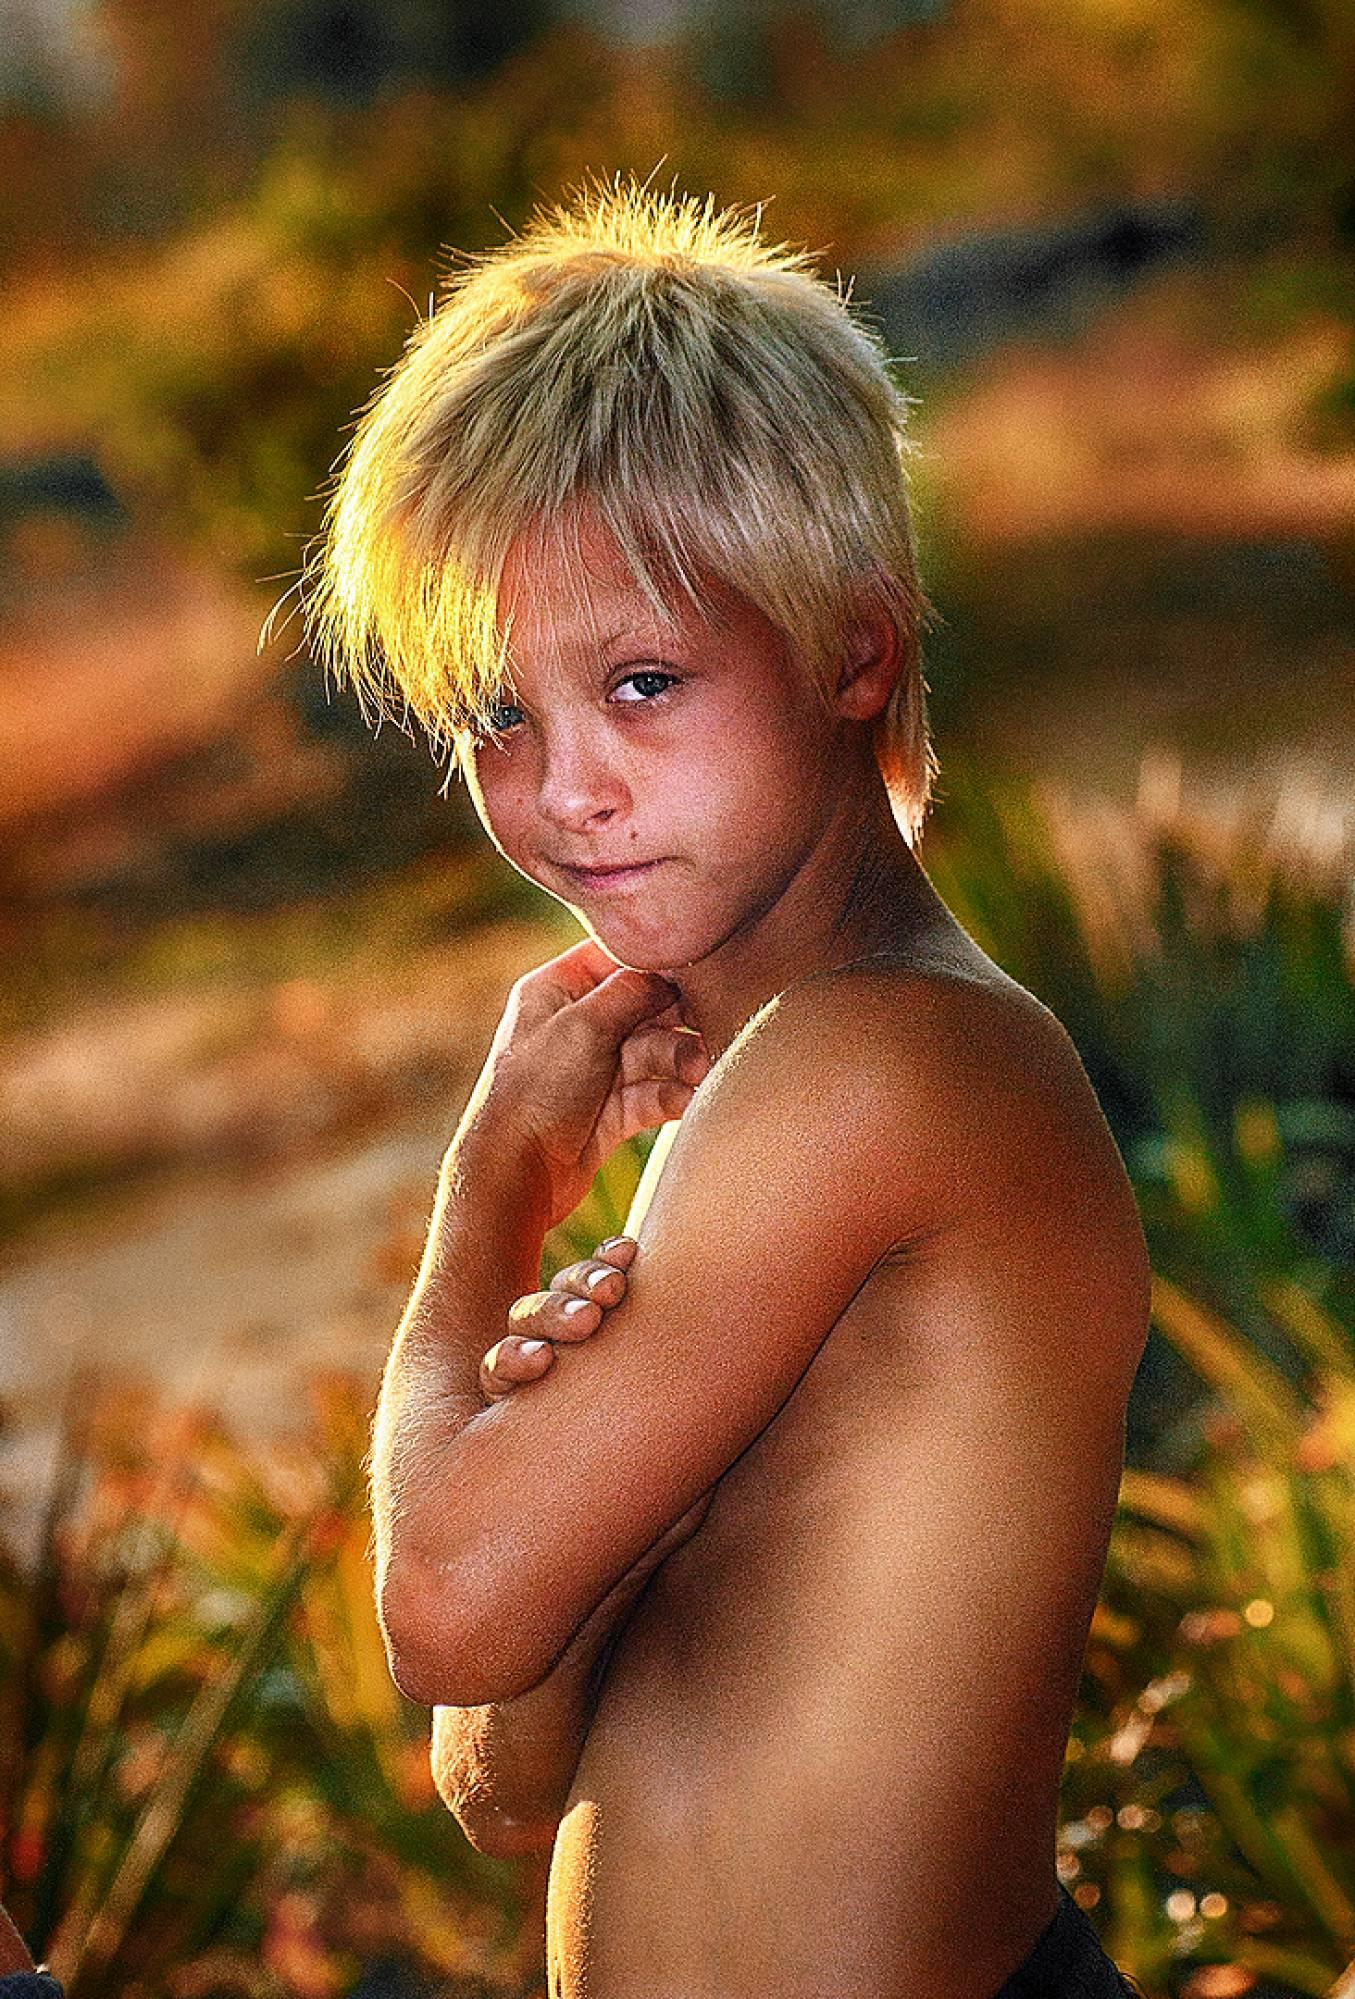 Мальчик Нудист 13